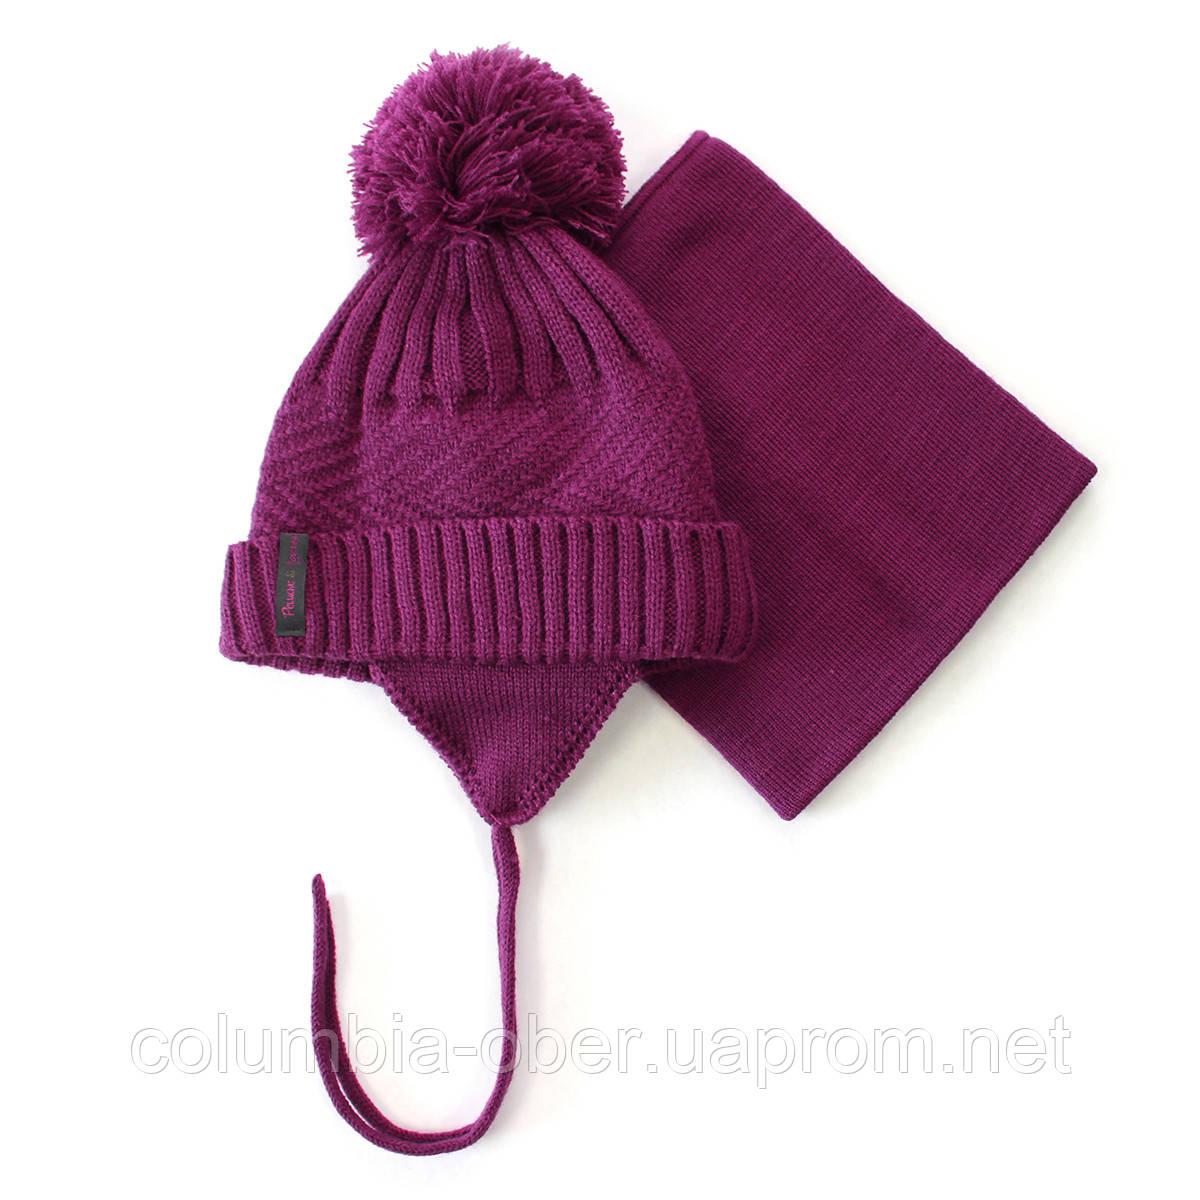 Зимняя шапка+манишка для девочки PELUCHE F17 ACC 72 EF Amethyste. Размеры 3/5 - 6/8.